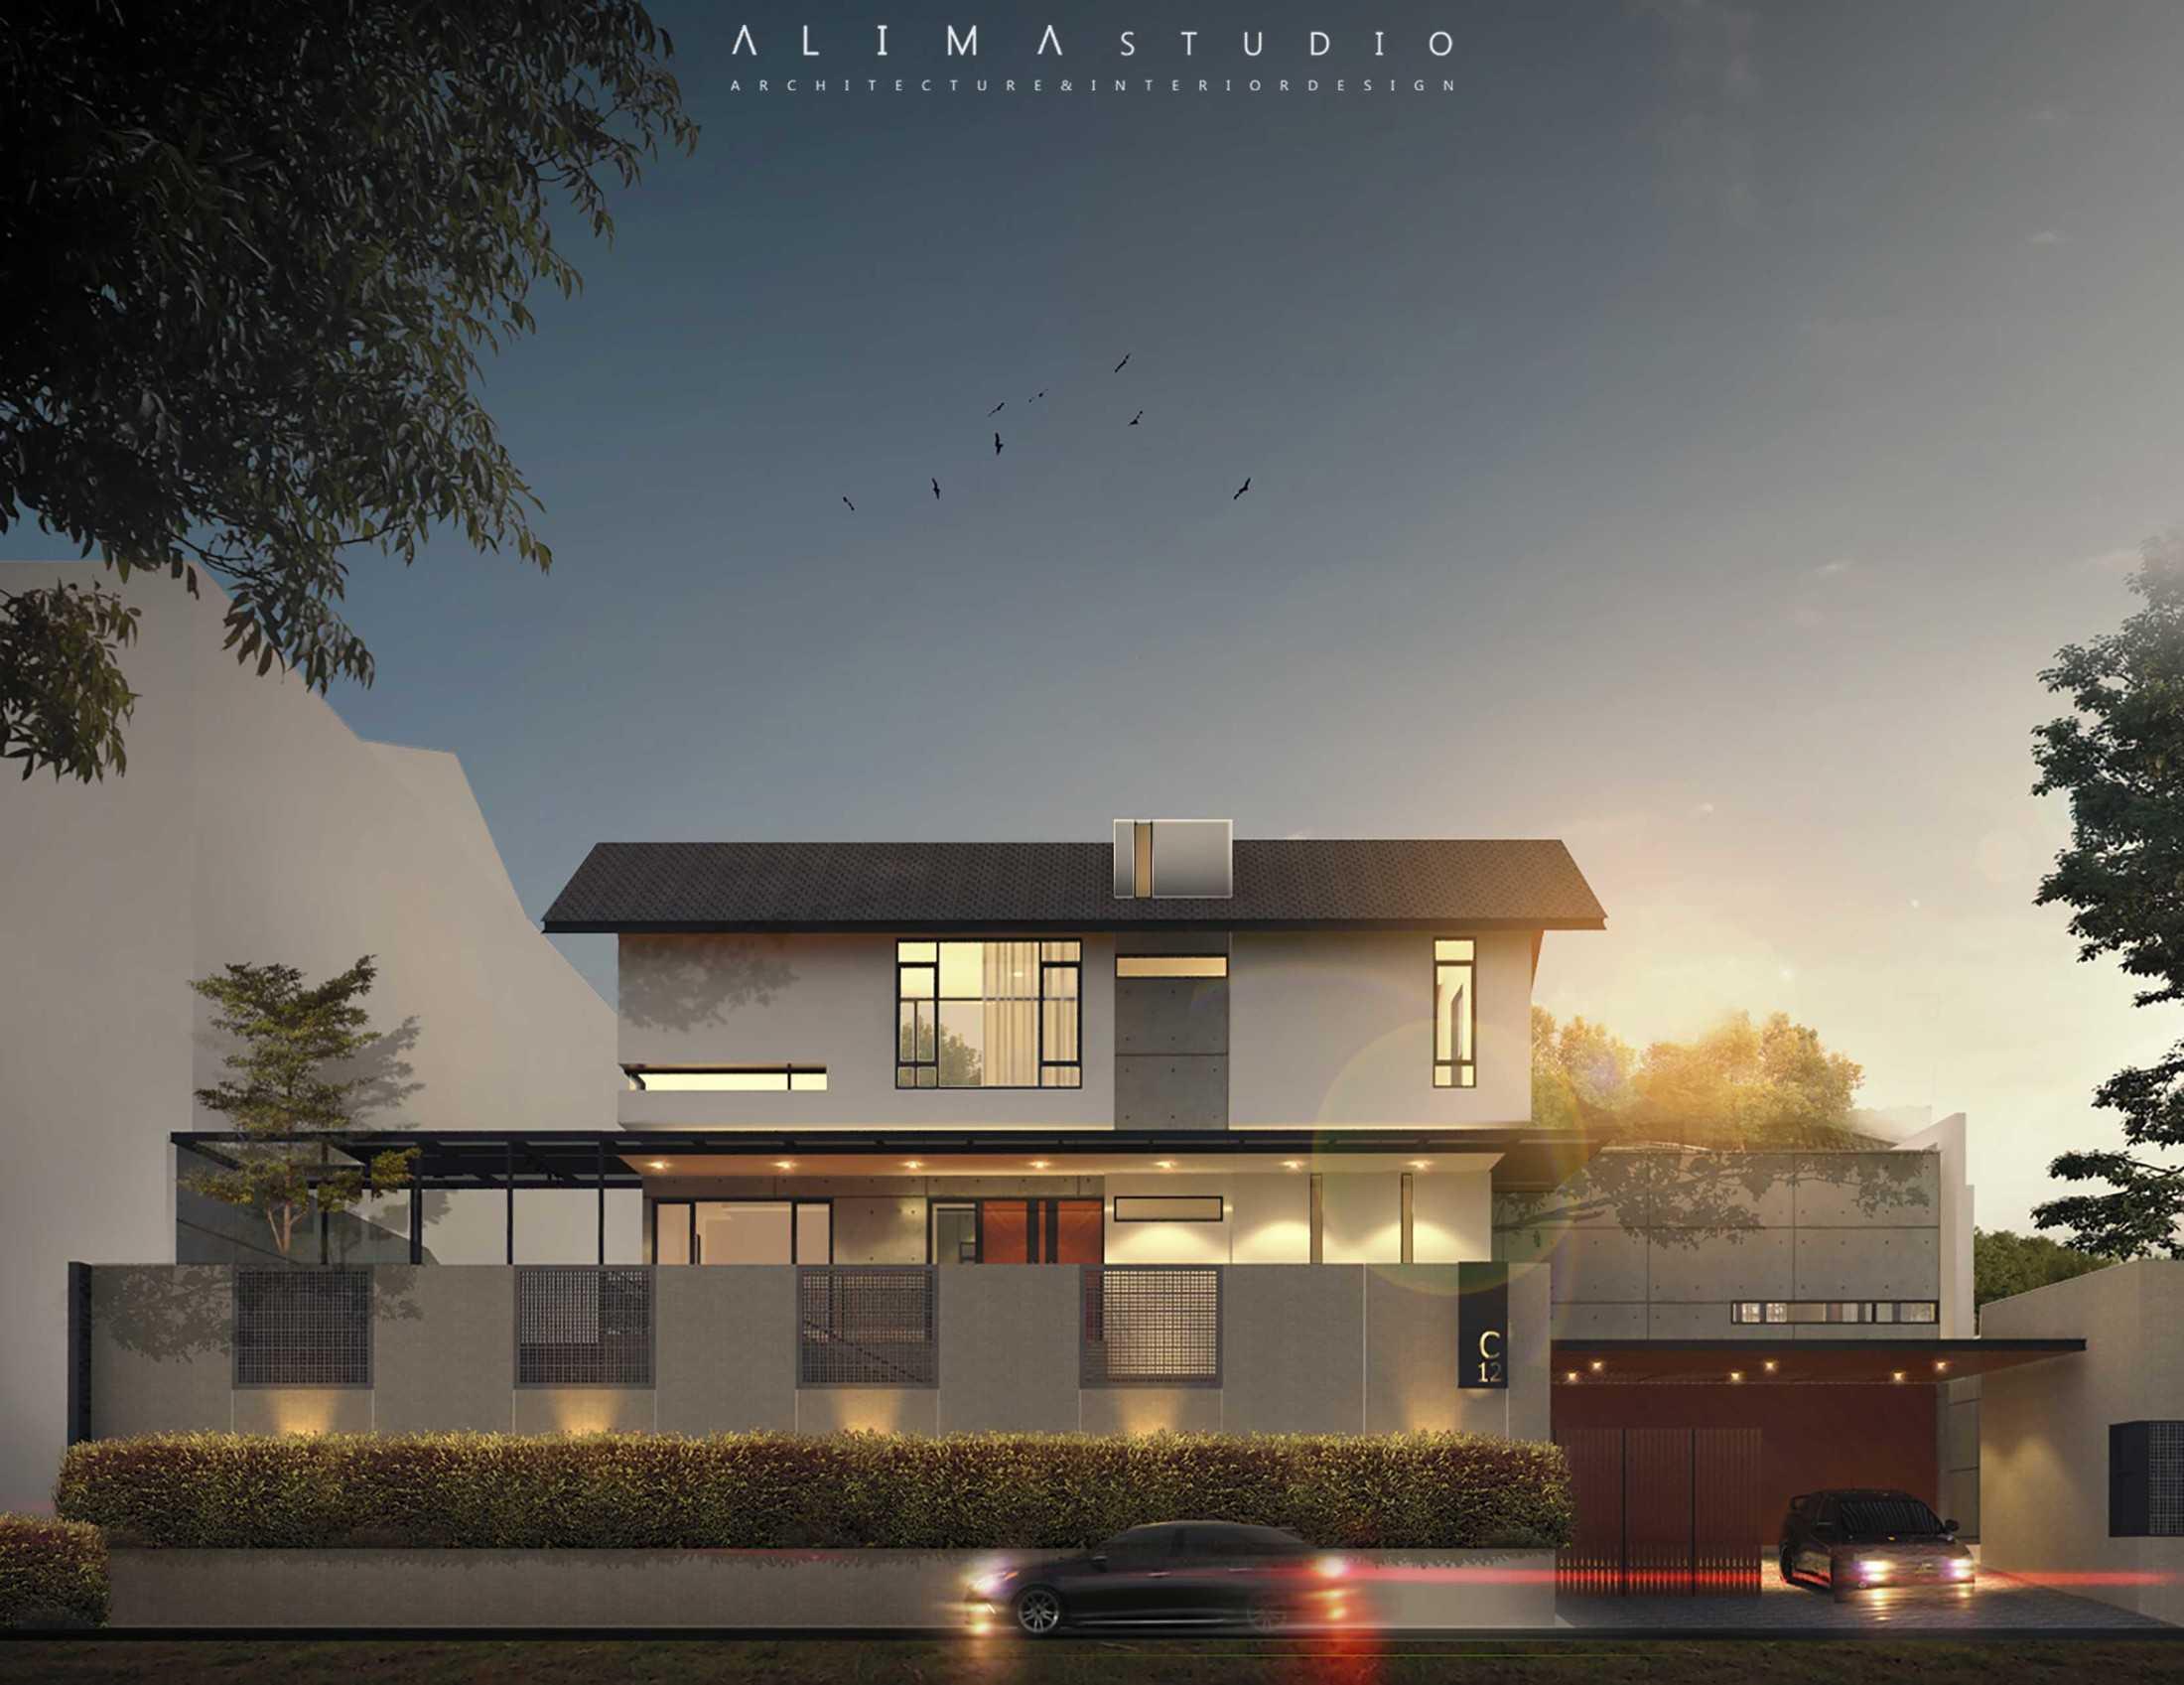 Alima Studio Sa House Makassar, Kota Makassar, Sulawesi Selatan, Indonesia Makassar, Kota Makassar, Sulawesi Selatan, Indonesia Alima-Studio-Sa-House  66571